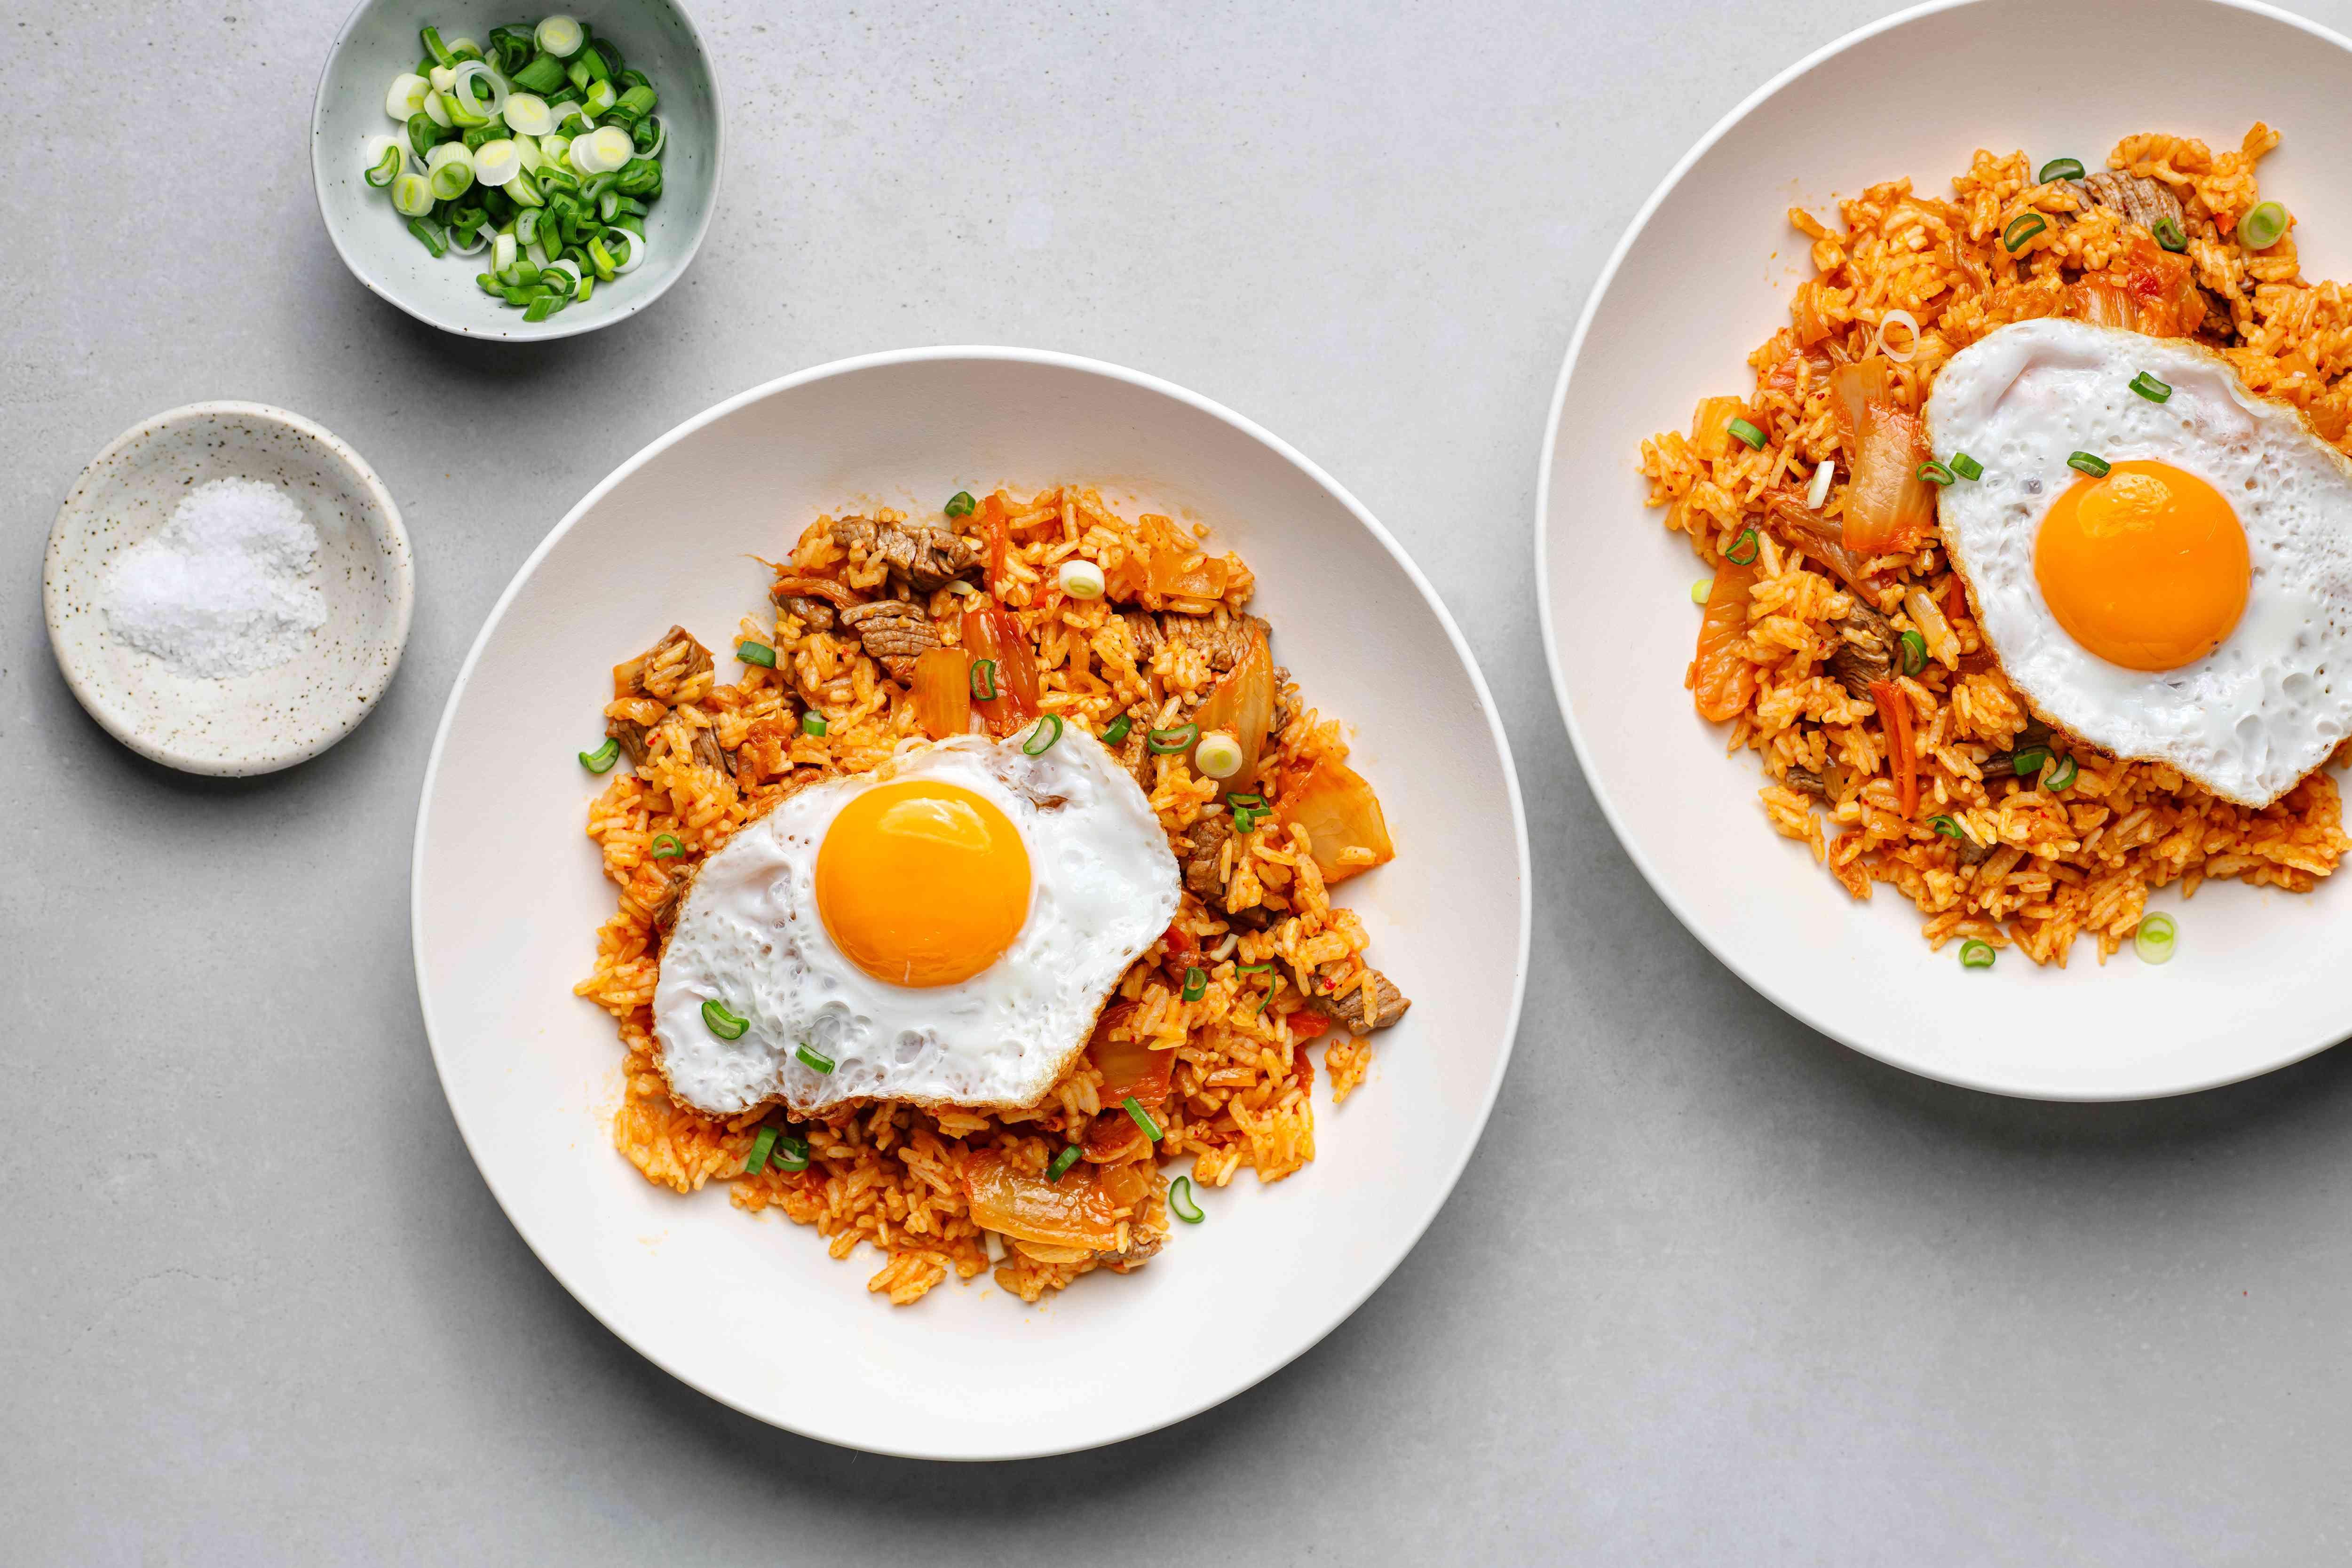 Kimchi Bokumbap: Kimchi Fried Rice with a fried egg on top